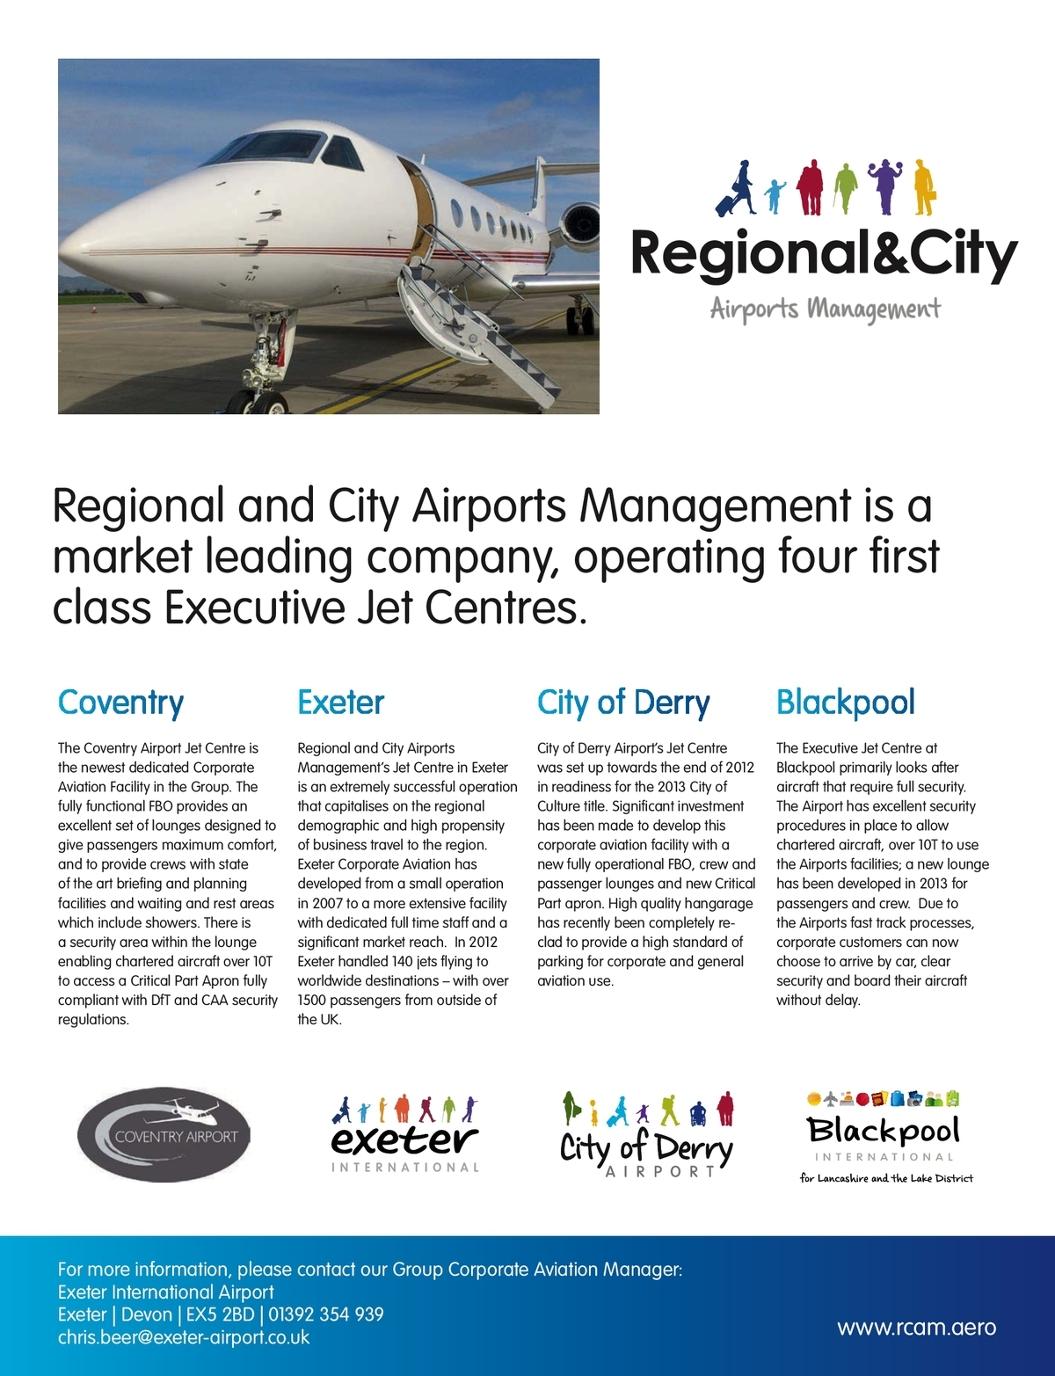 January 2014 Business Airport International - UKi